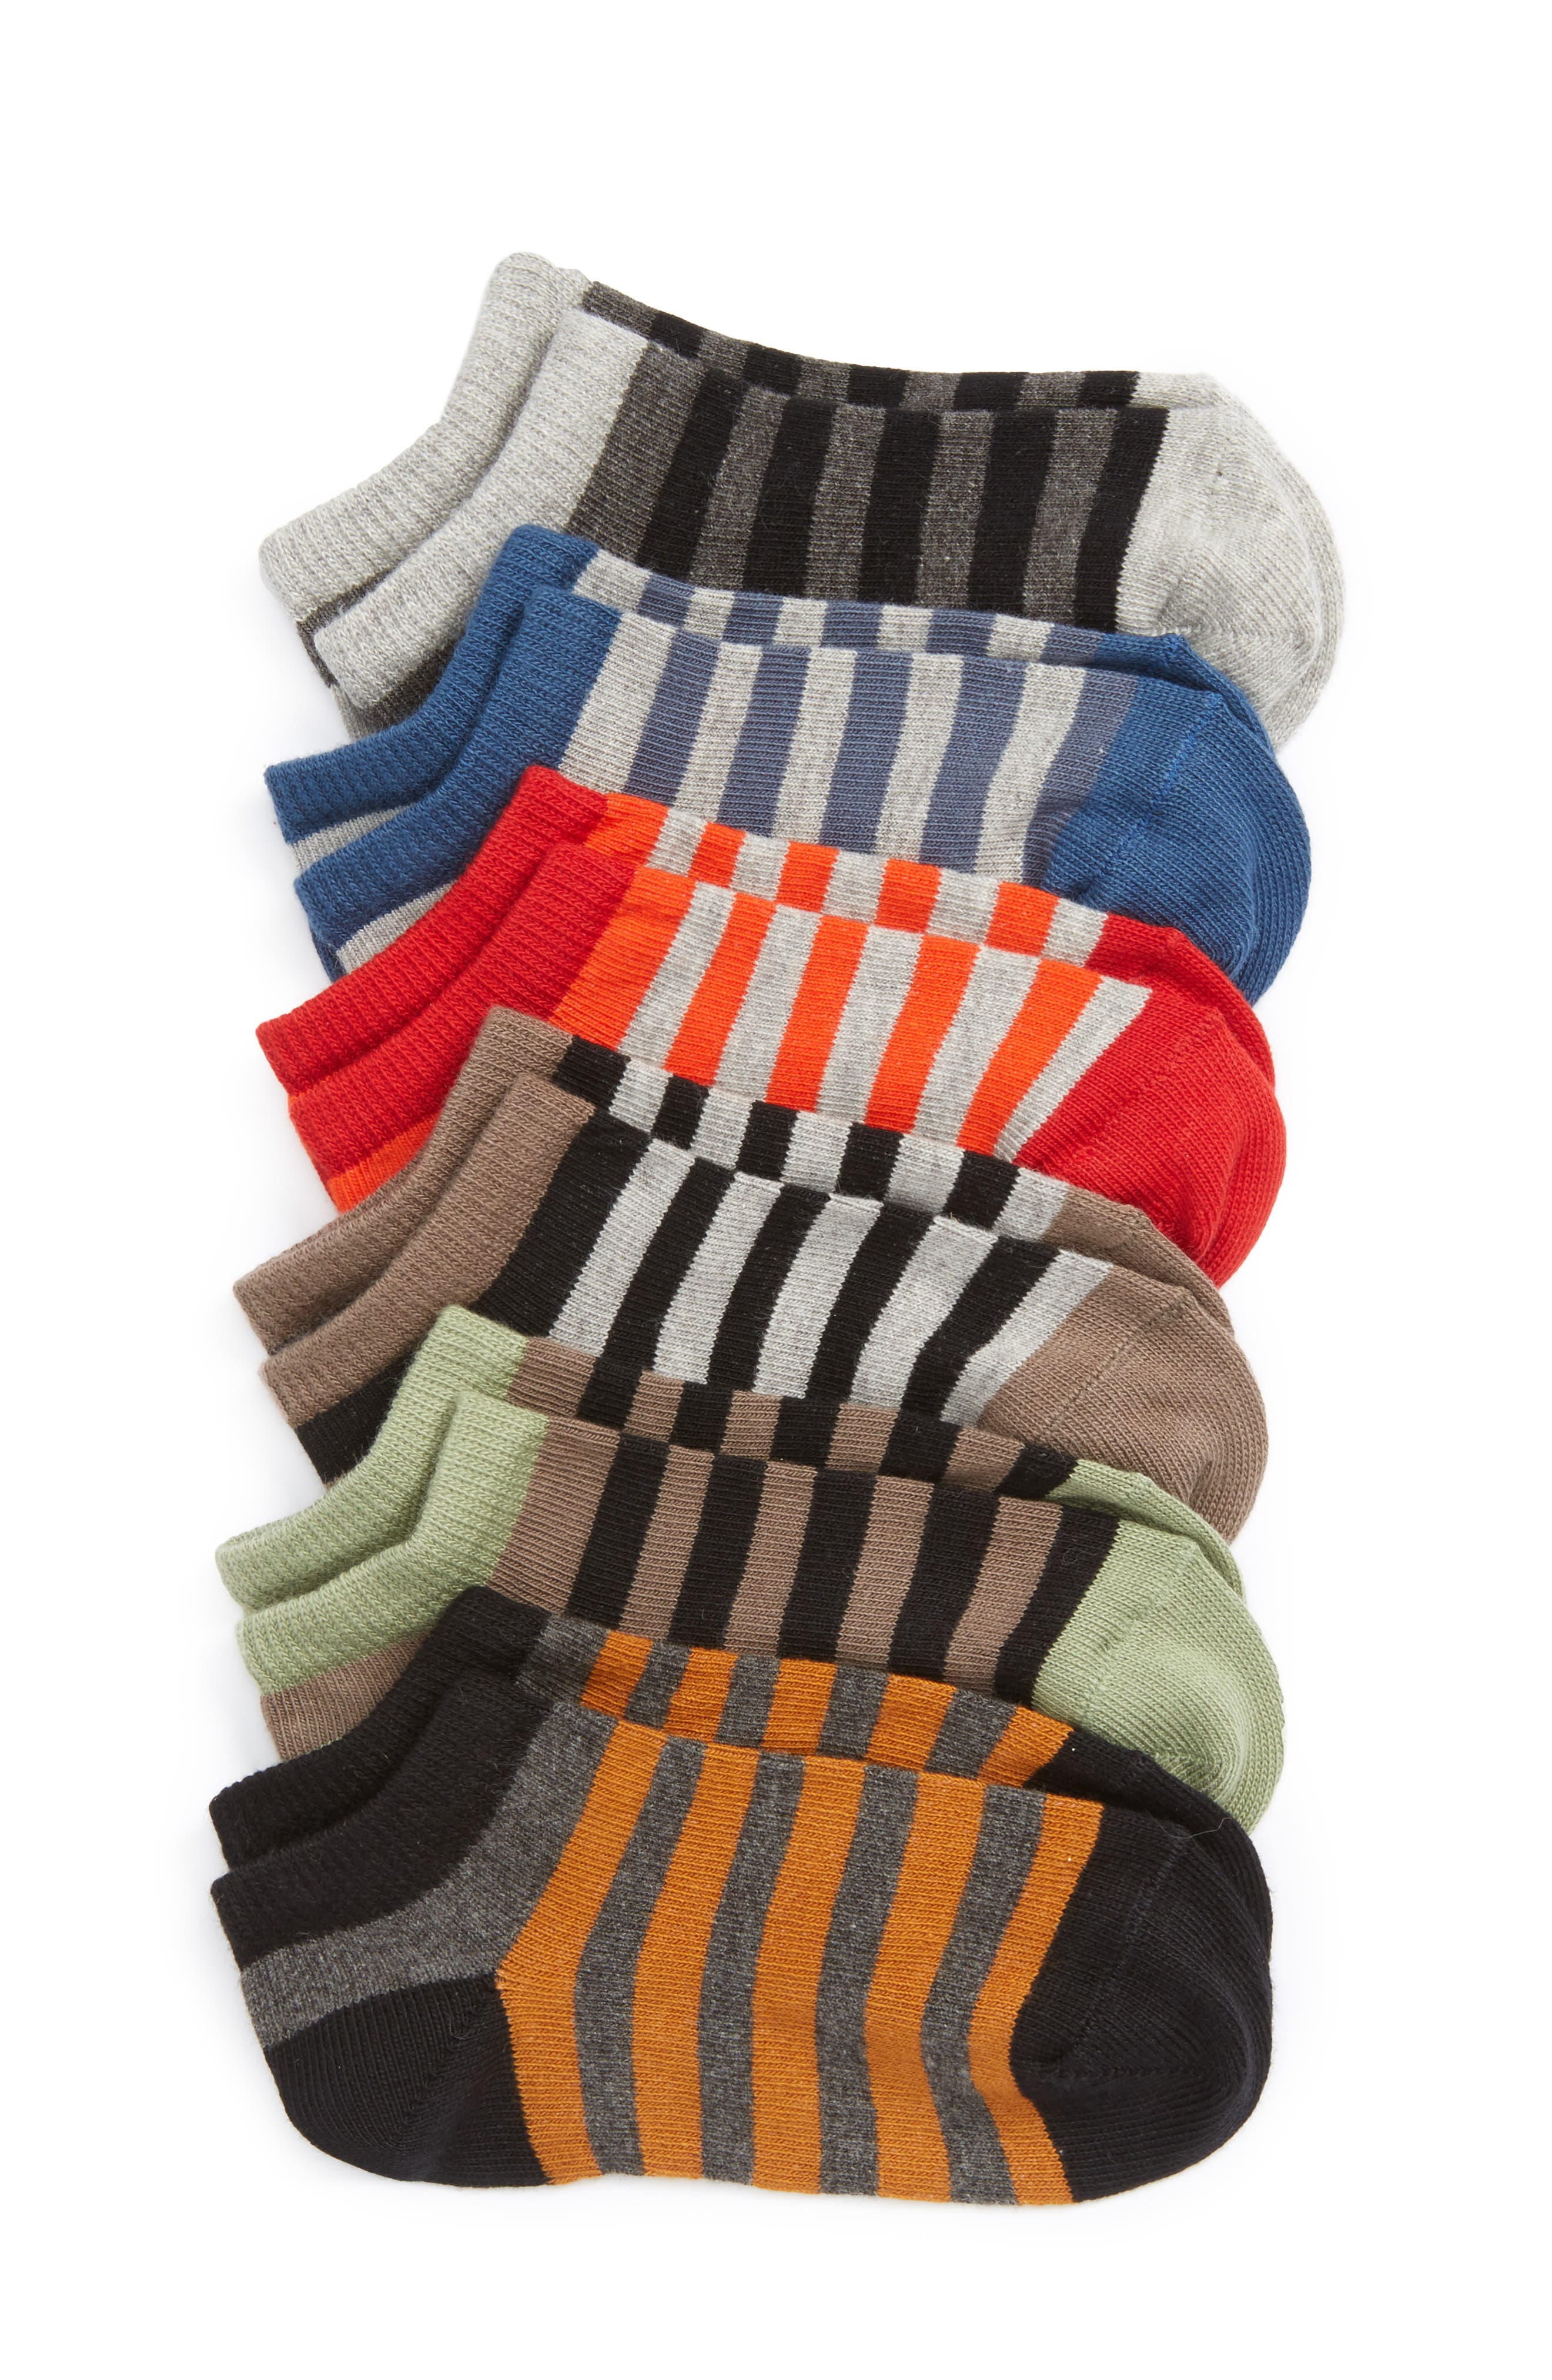 Assorted 6-Pack No-Show Socks,                             Main thumbnail 1, color,                             Blue Nautical